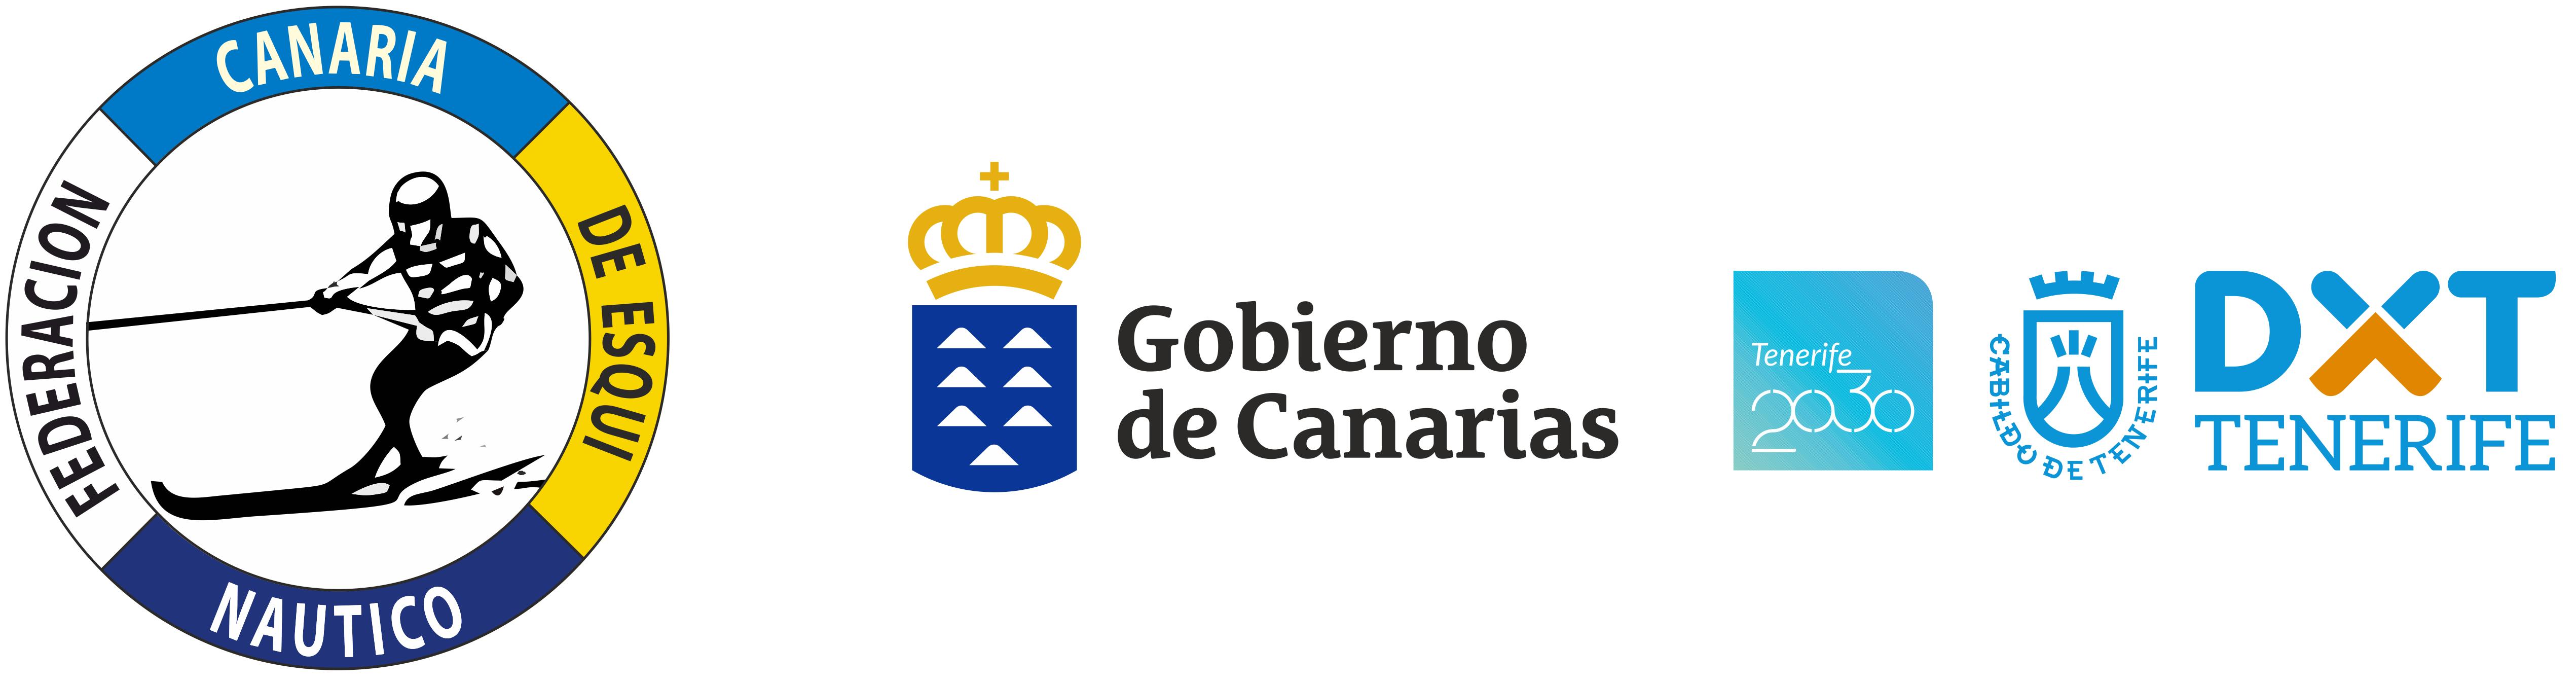 Esquí Nautico Canarias Logo